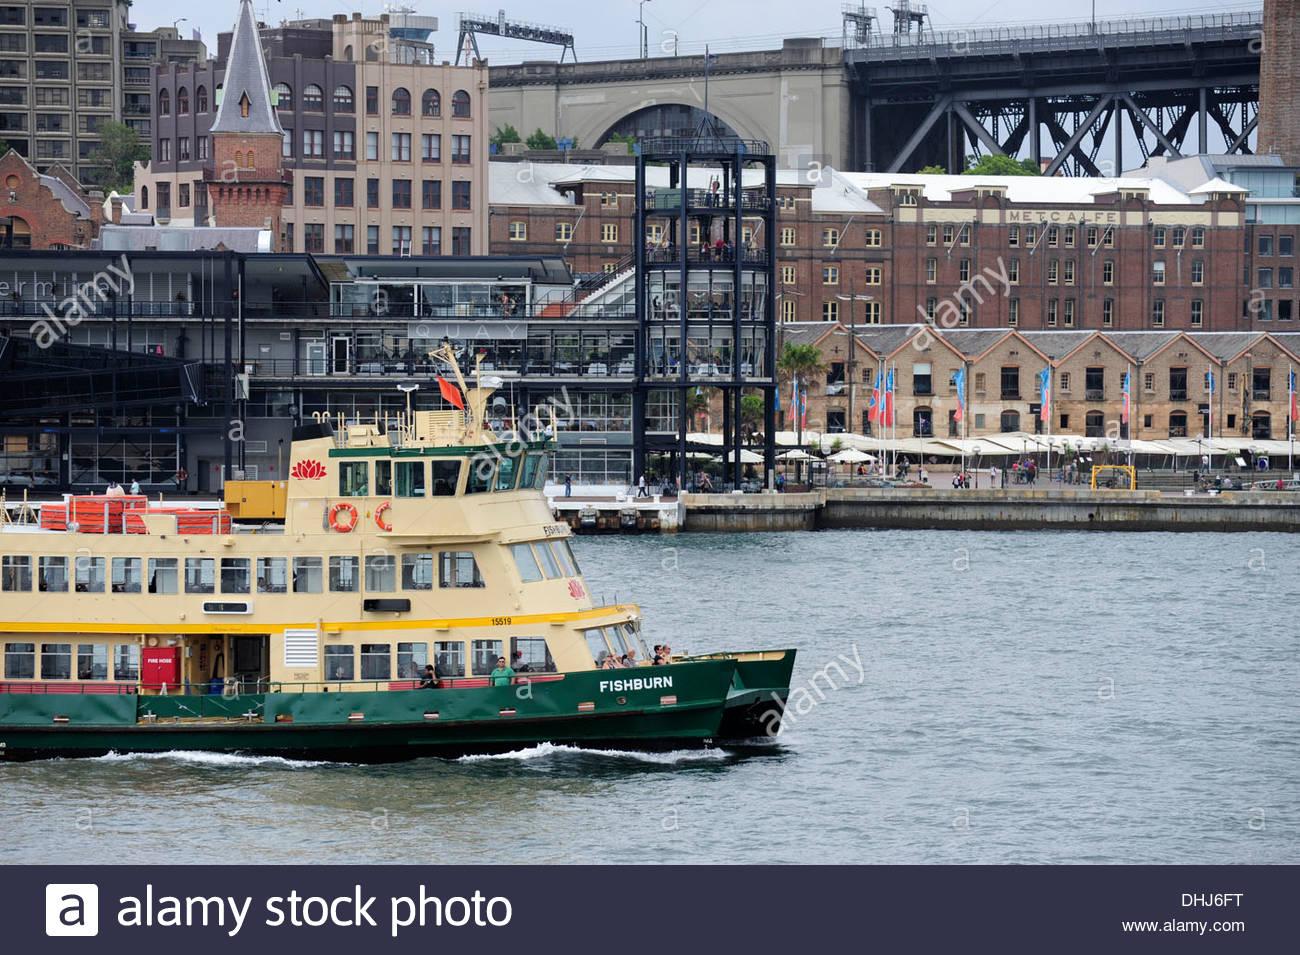 Ferry leaving Circular Quay, Sydney Cove, The Rocks, Sydney Harbour, Sydney, New South Wales, NSW, Australia - Stock Image